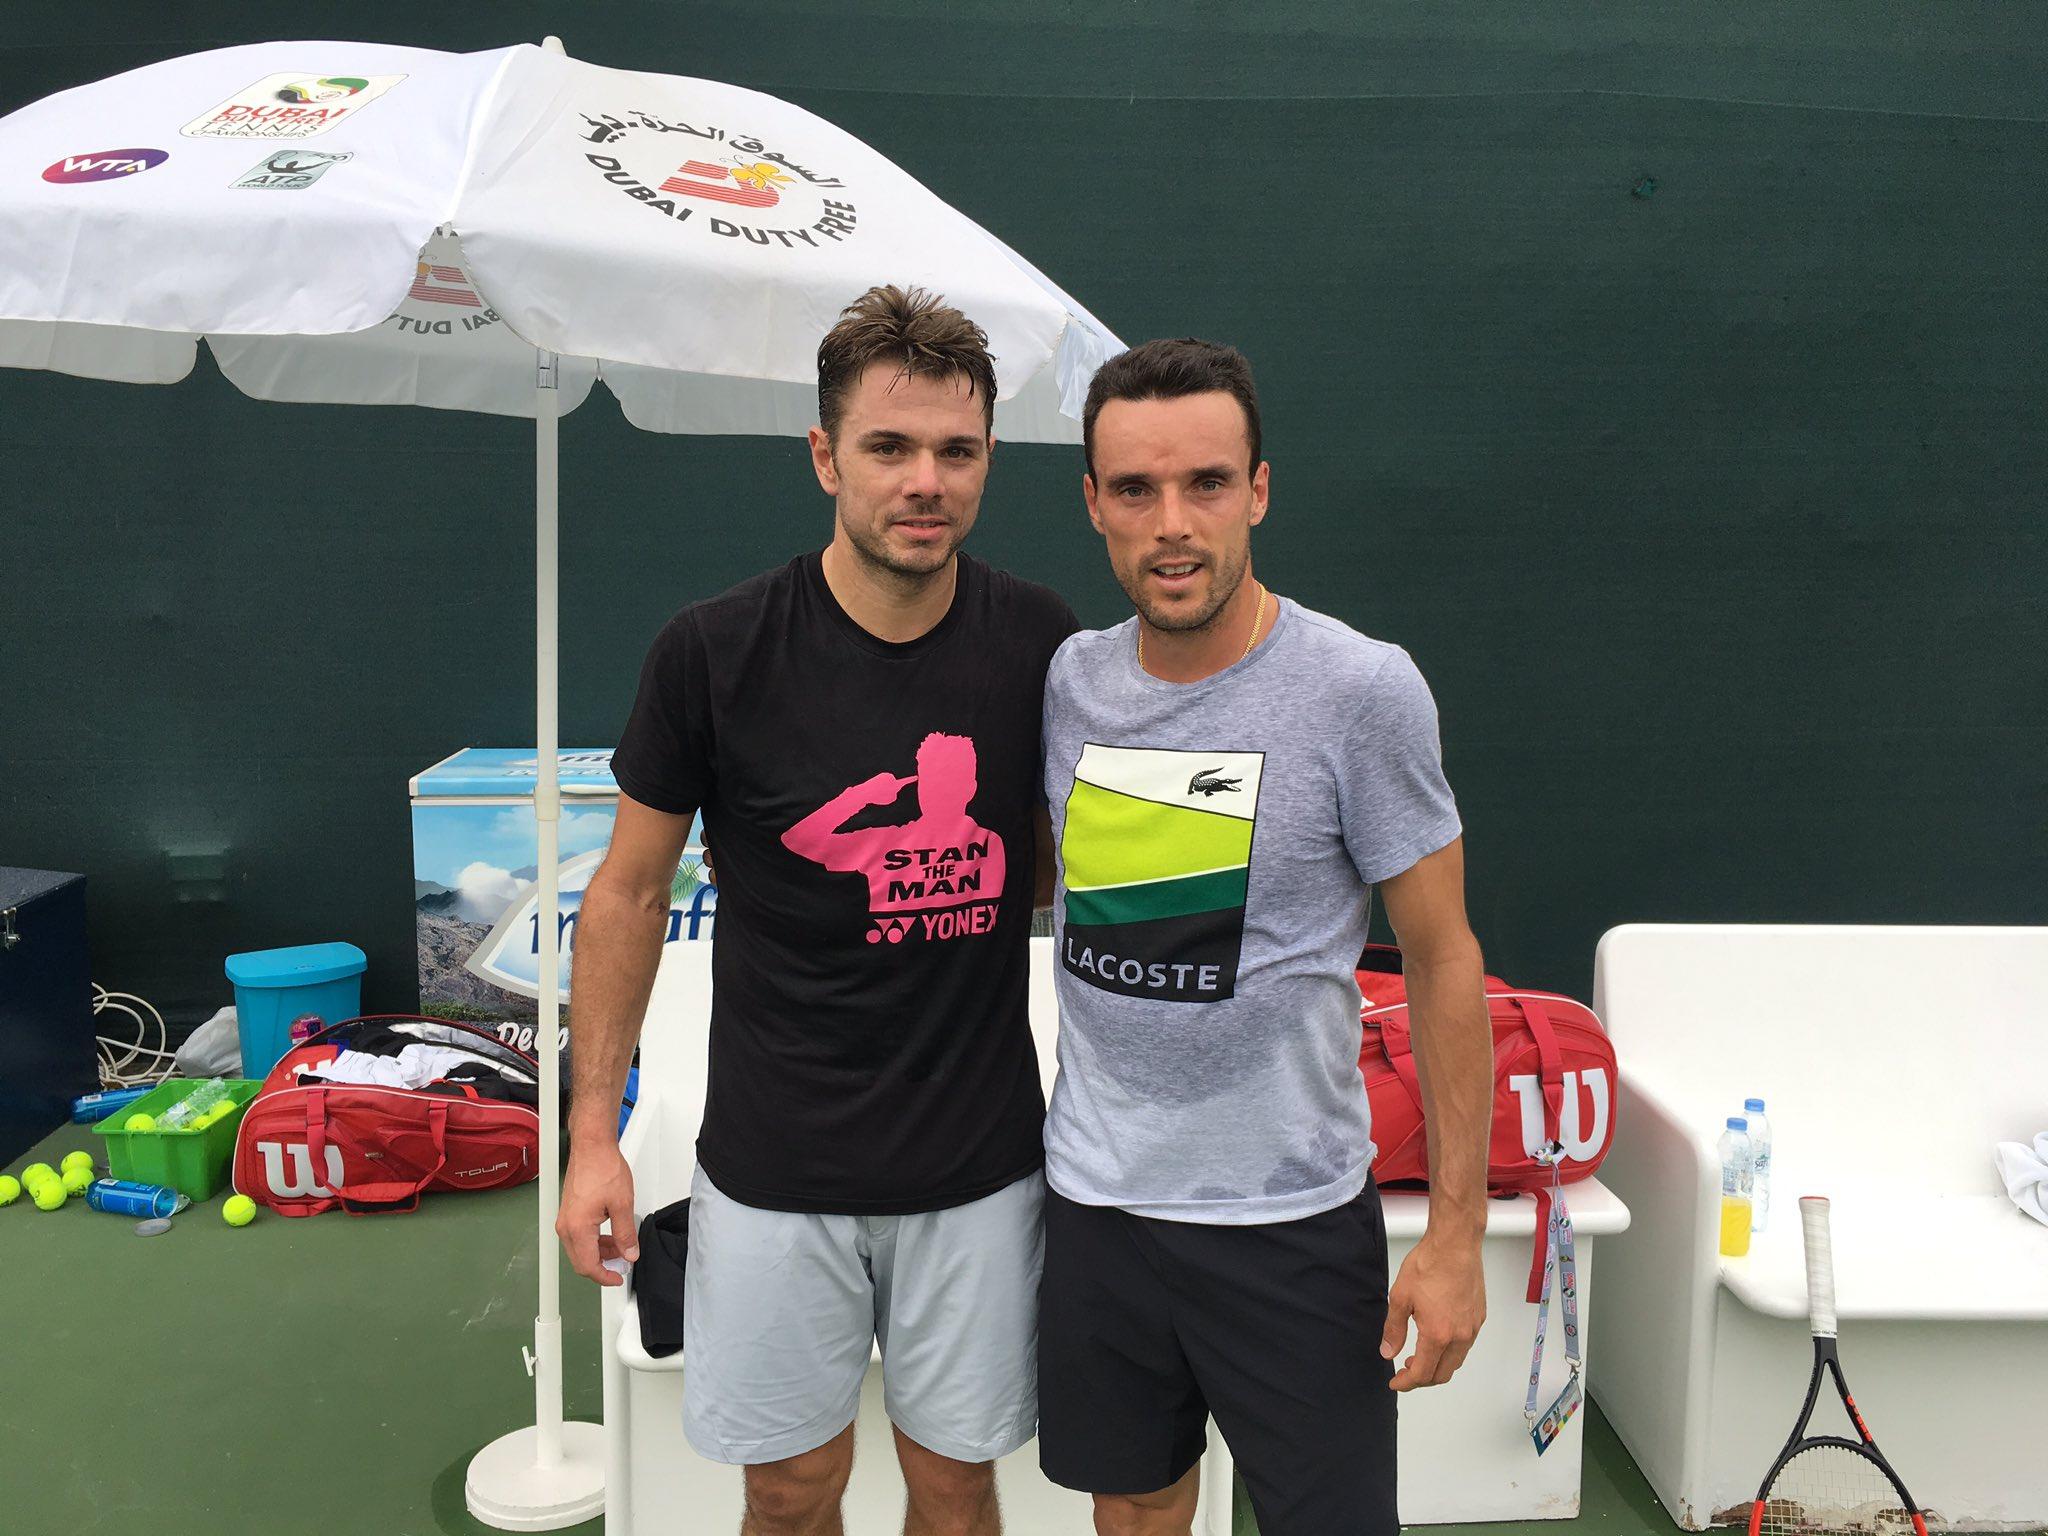 Great practice with @BautistaAgut @DDFTennis !! Gracias amigo ゚ラᆪ゚ヌᆰ゚ヌᄌ゚マピマᄏ゚マテ゚マᄏ゚ニユ゚ムユ゚ムノ゚マᄏ゚リチ https://t.co/yvkZs5E4s9